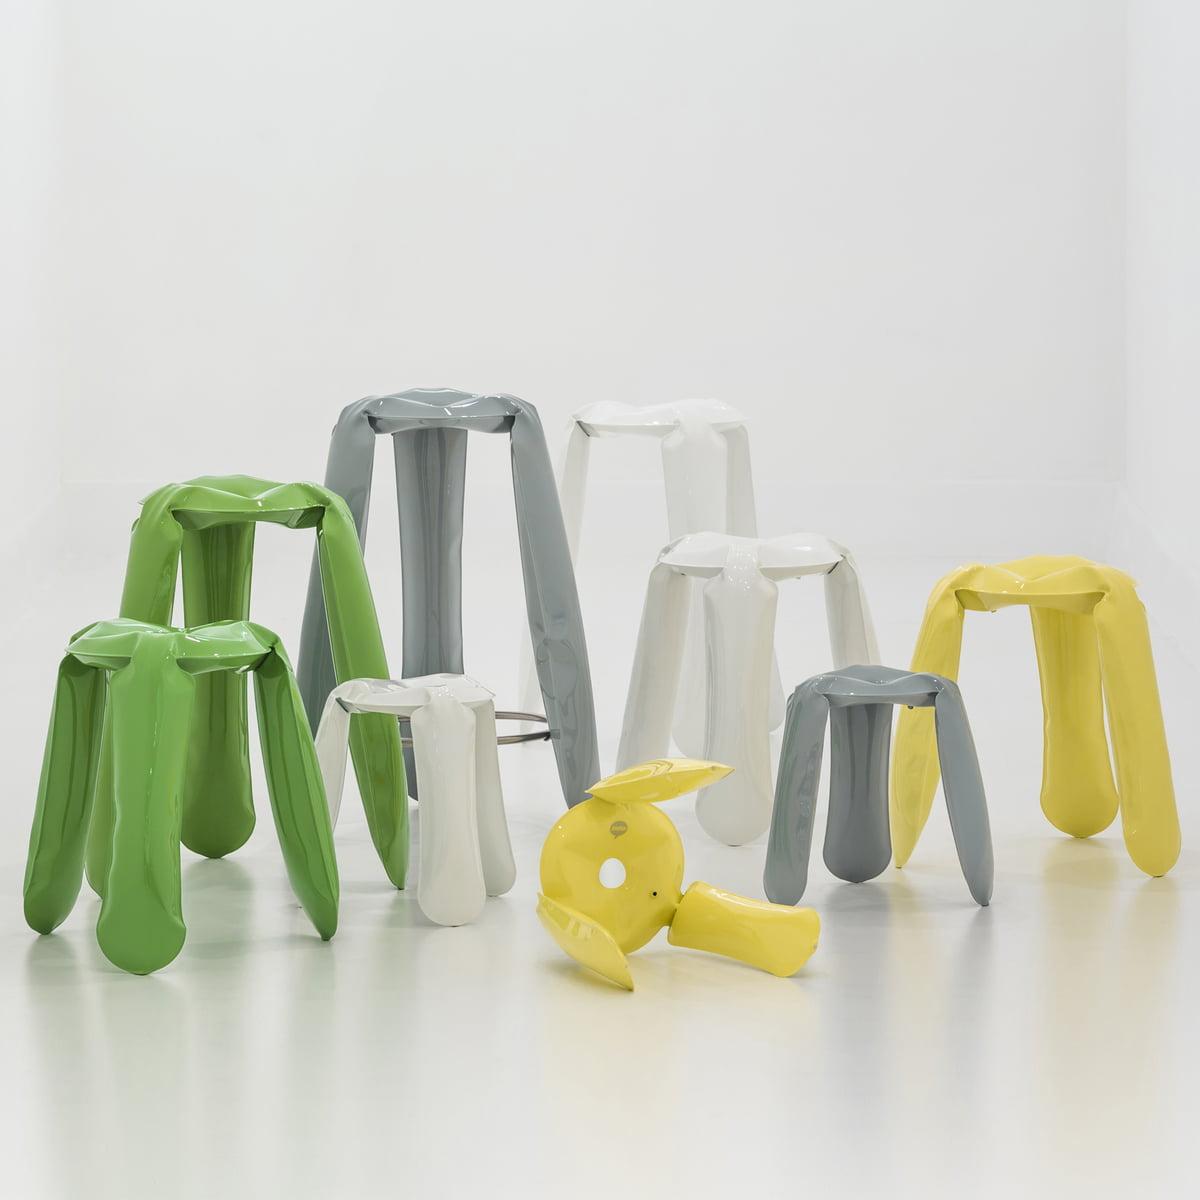 Astonishing Zieta Plopp Bar Stool Black Inzonedesignstudio Interior Chair Design Inzonedesignstudiocom